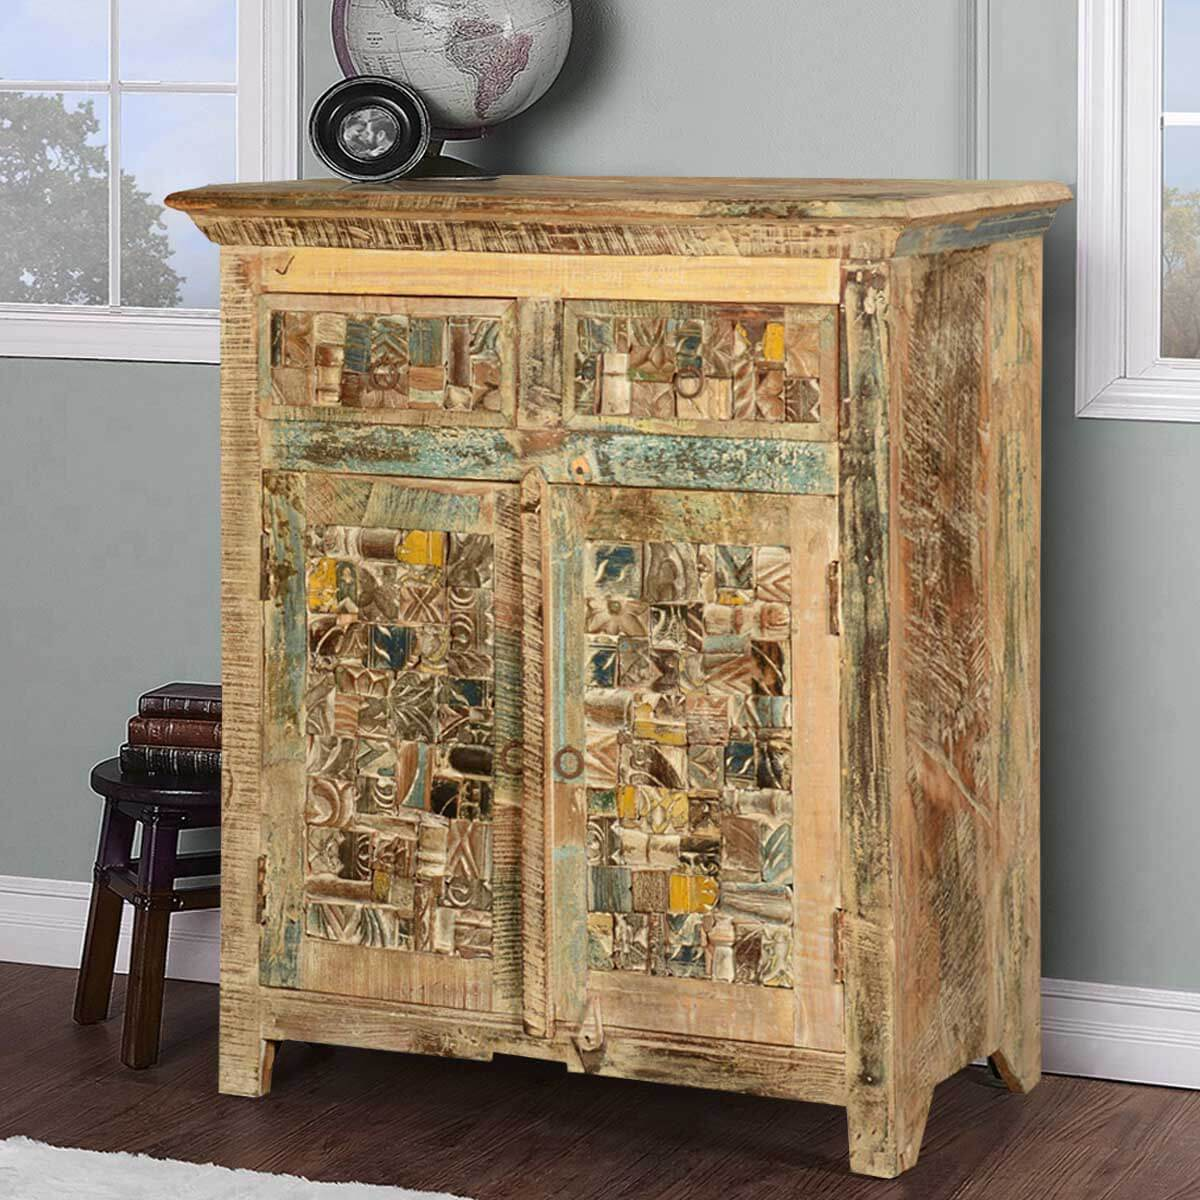 Havelock Mosaic Reclaimed Wood Freestanding 2 Drawer Sideboard Cabinet